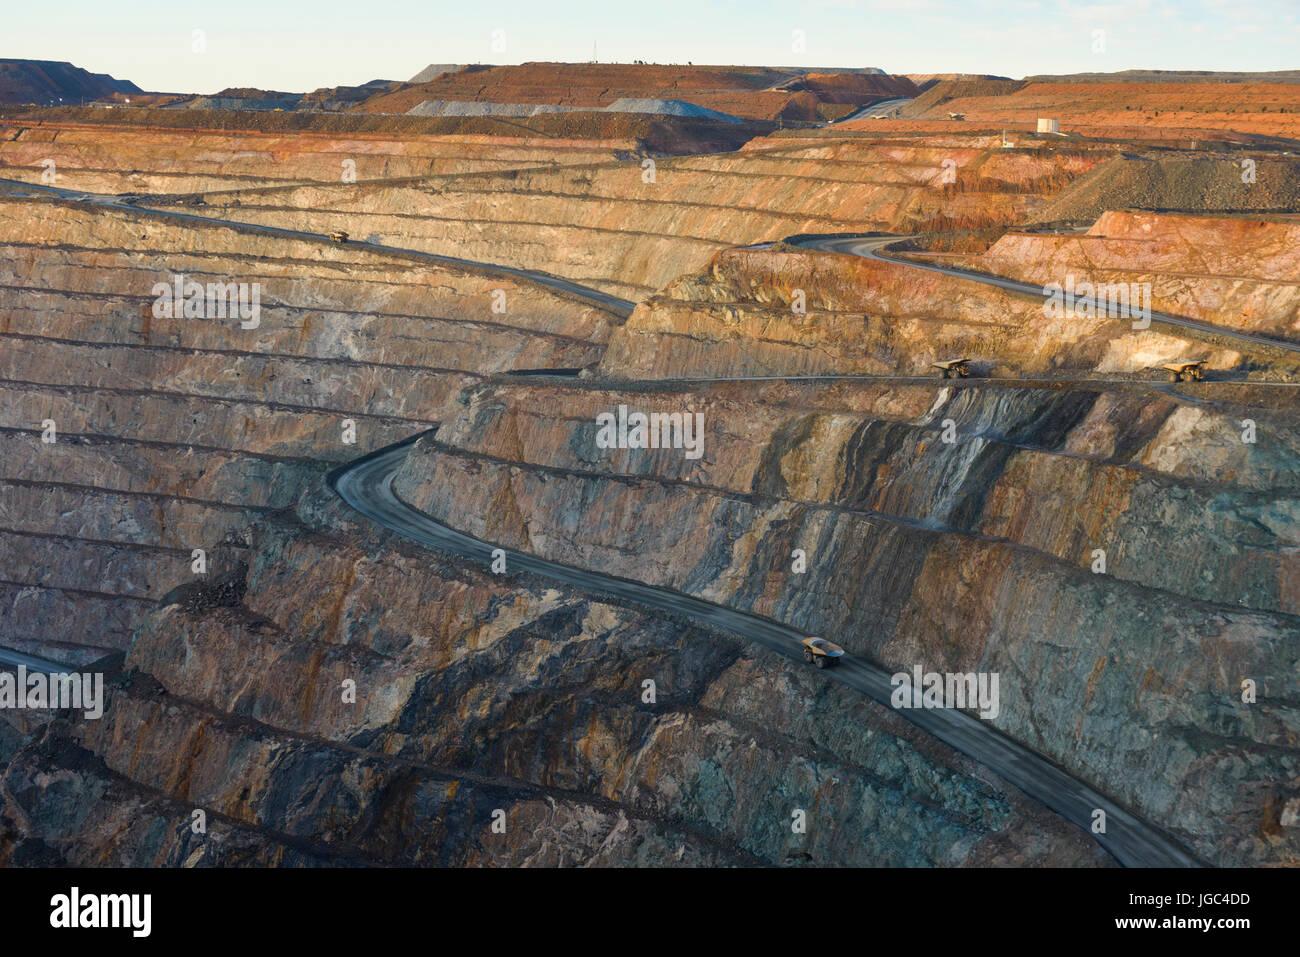 Mina a cielo abierto, minas de oro, Kalgoorlie, Australia Occidental Imagen De Stock